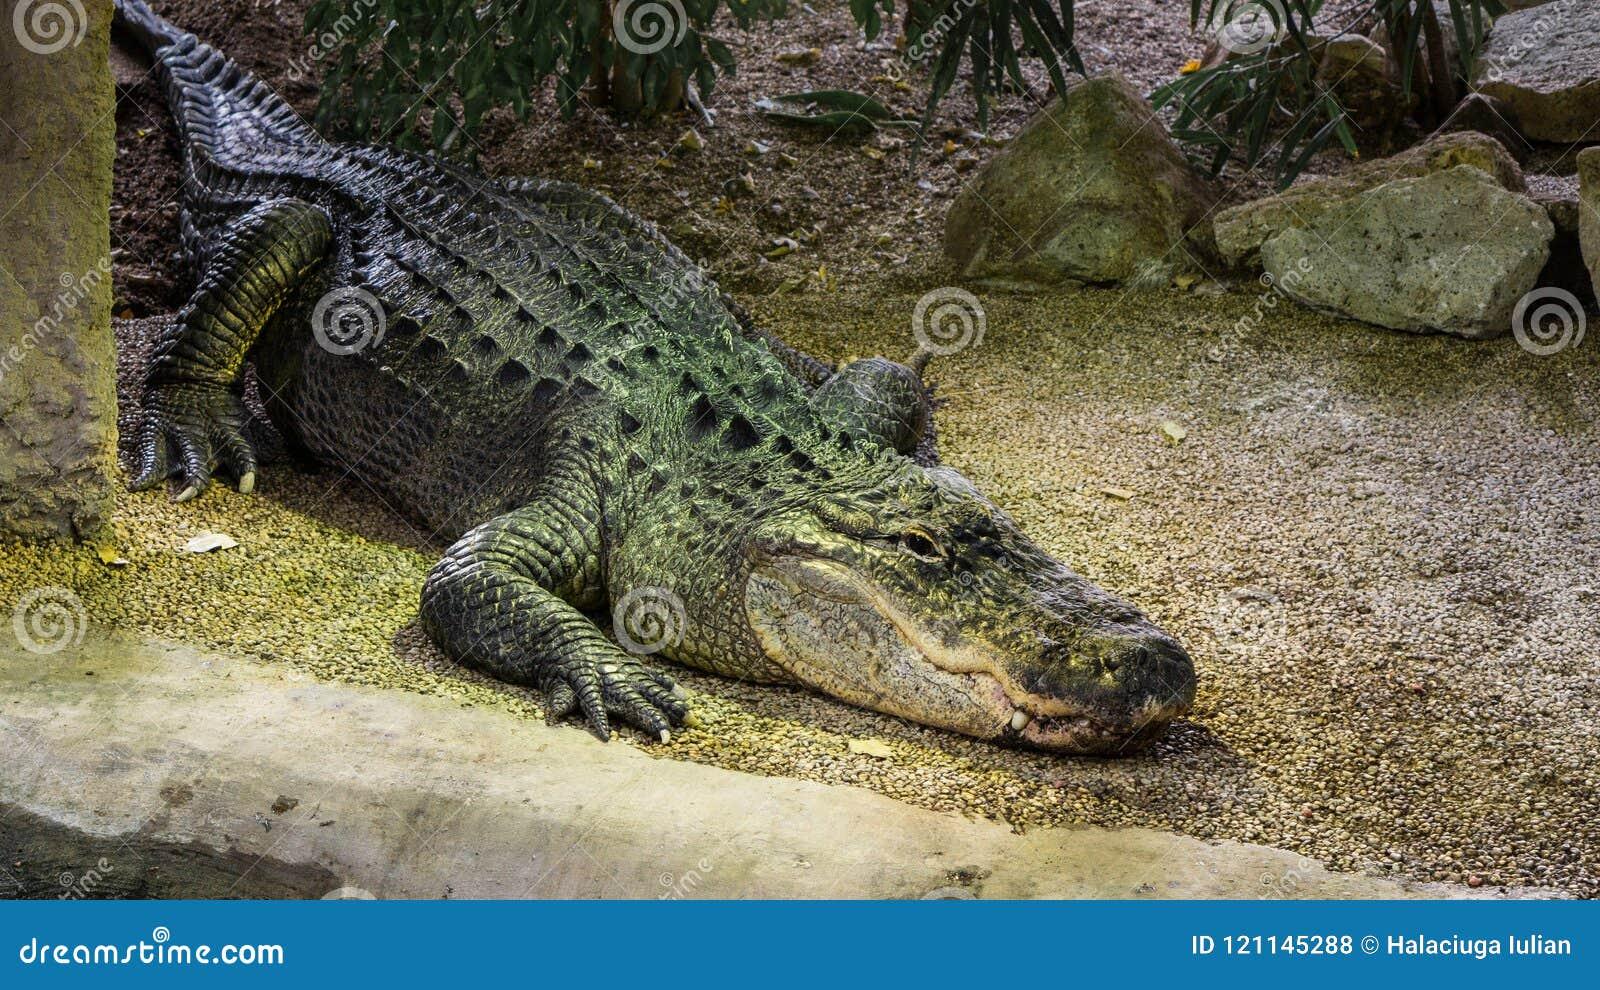 American Mississippiensis Alligator in artificial habitat